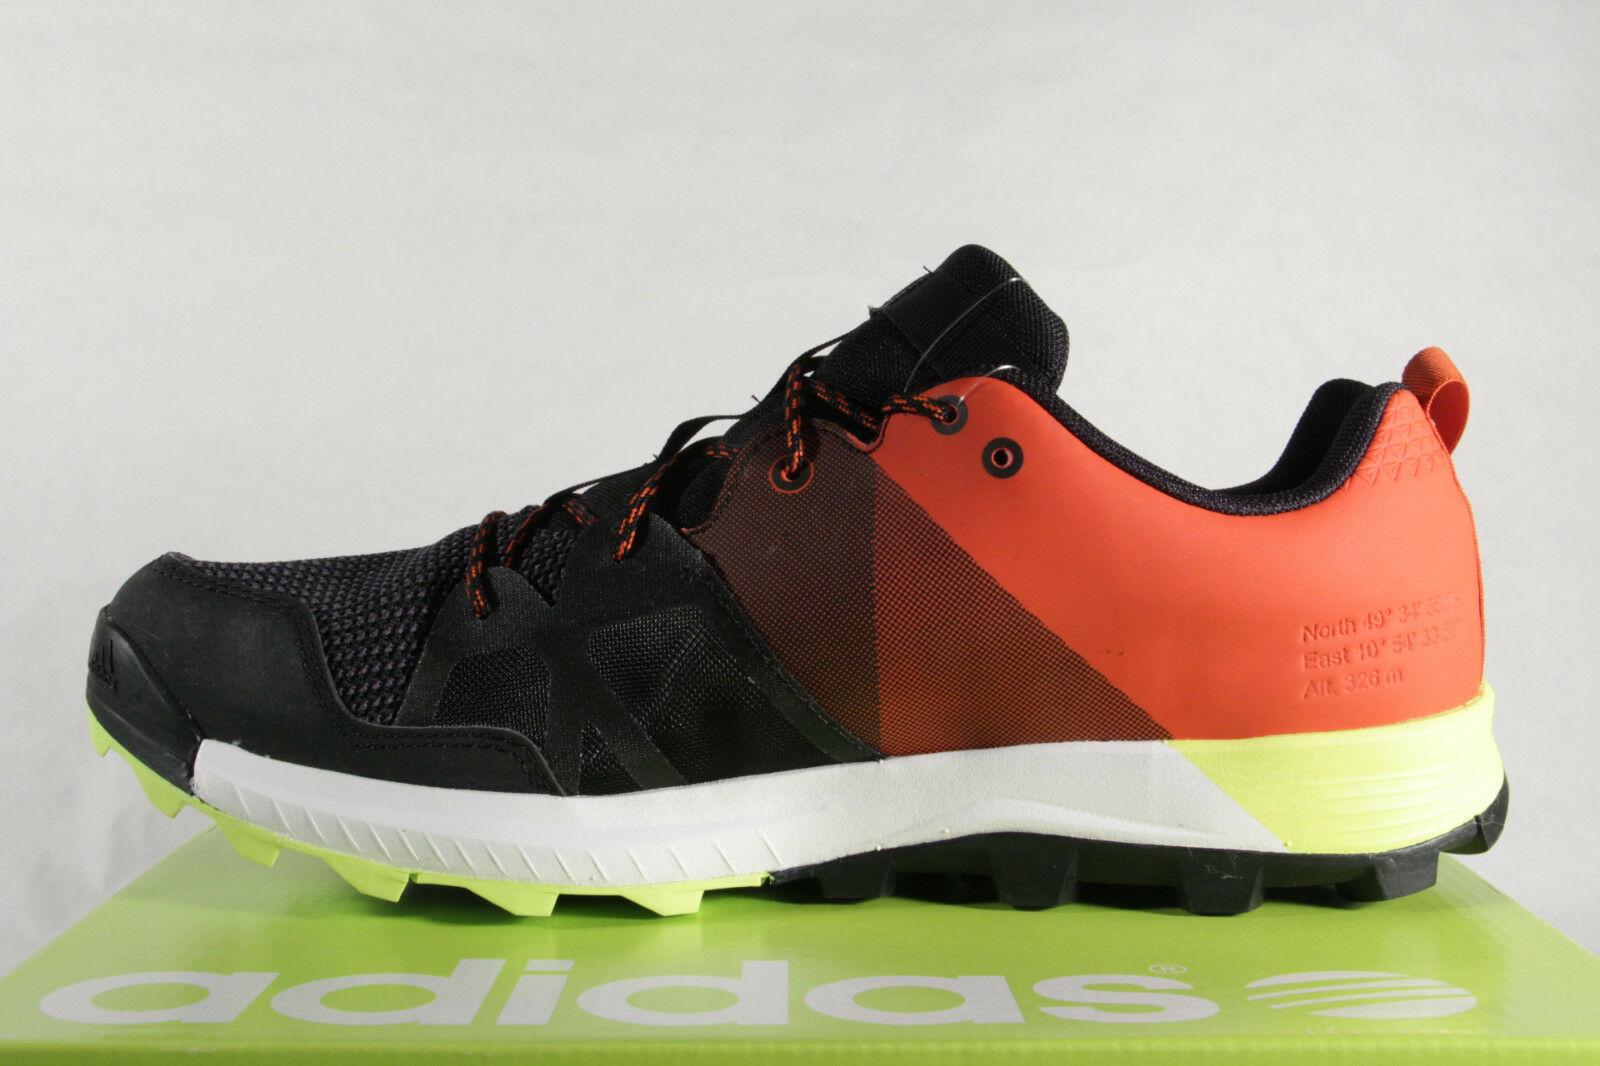 Adidas Herren Sportschuhe Laufschuhe Laufschuhe Laufschuhe Turnschuhe TR8 Kanadia schwarz rot NEU ebc252